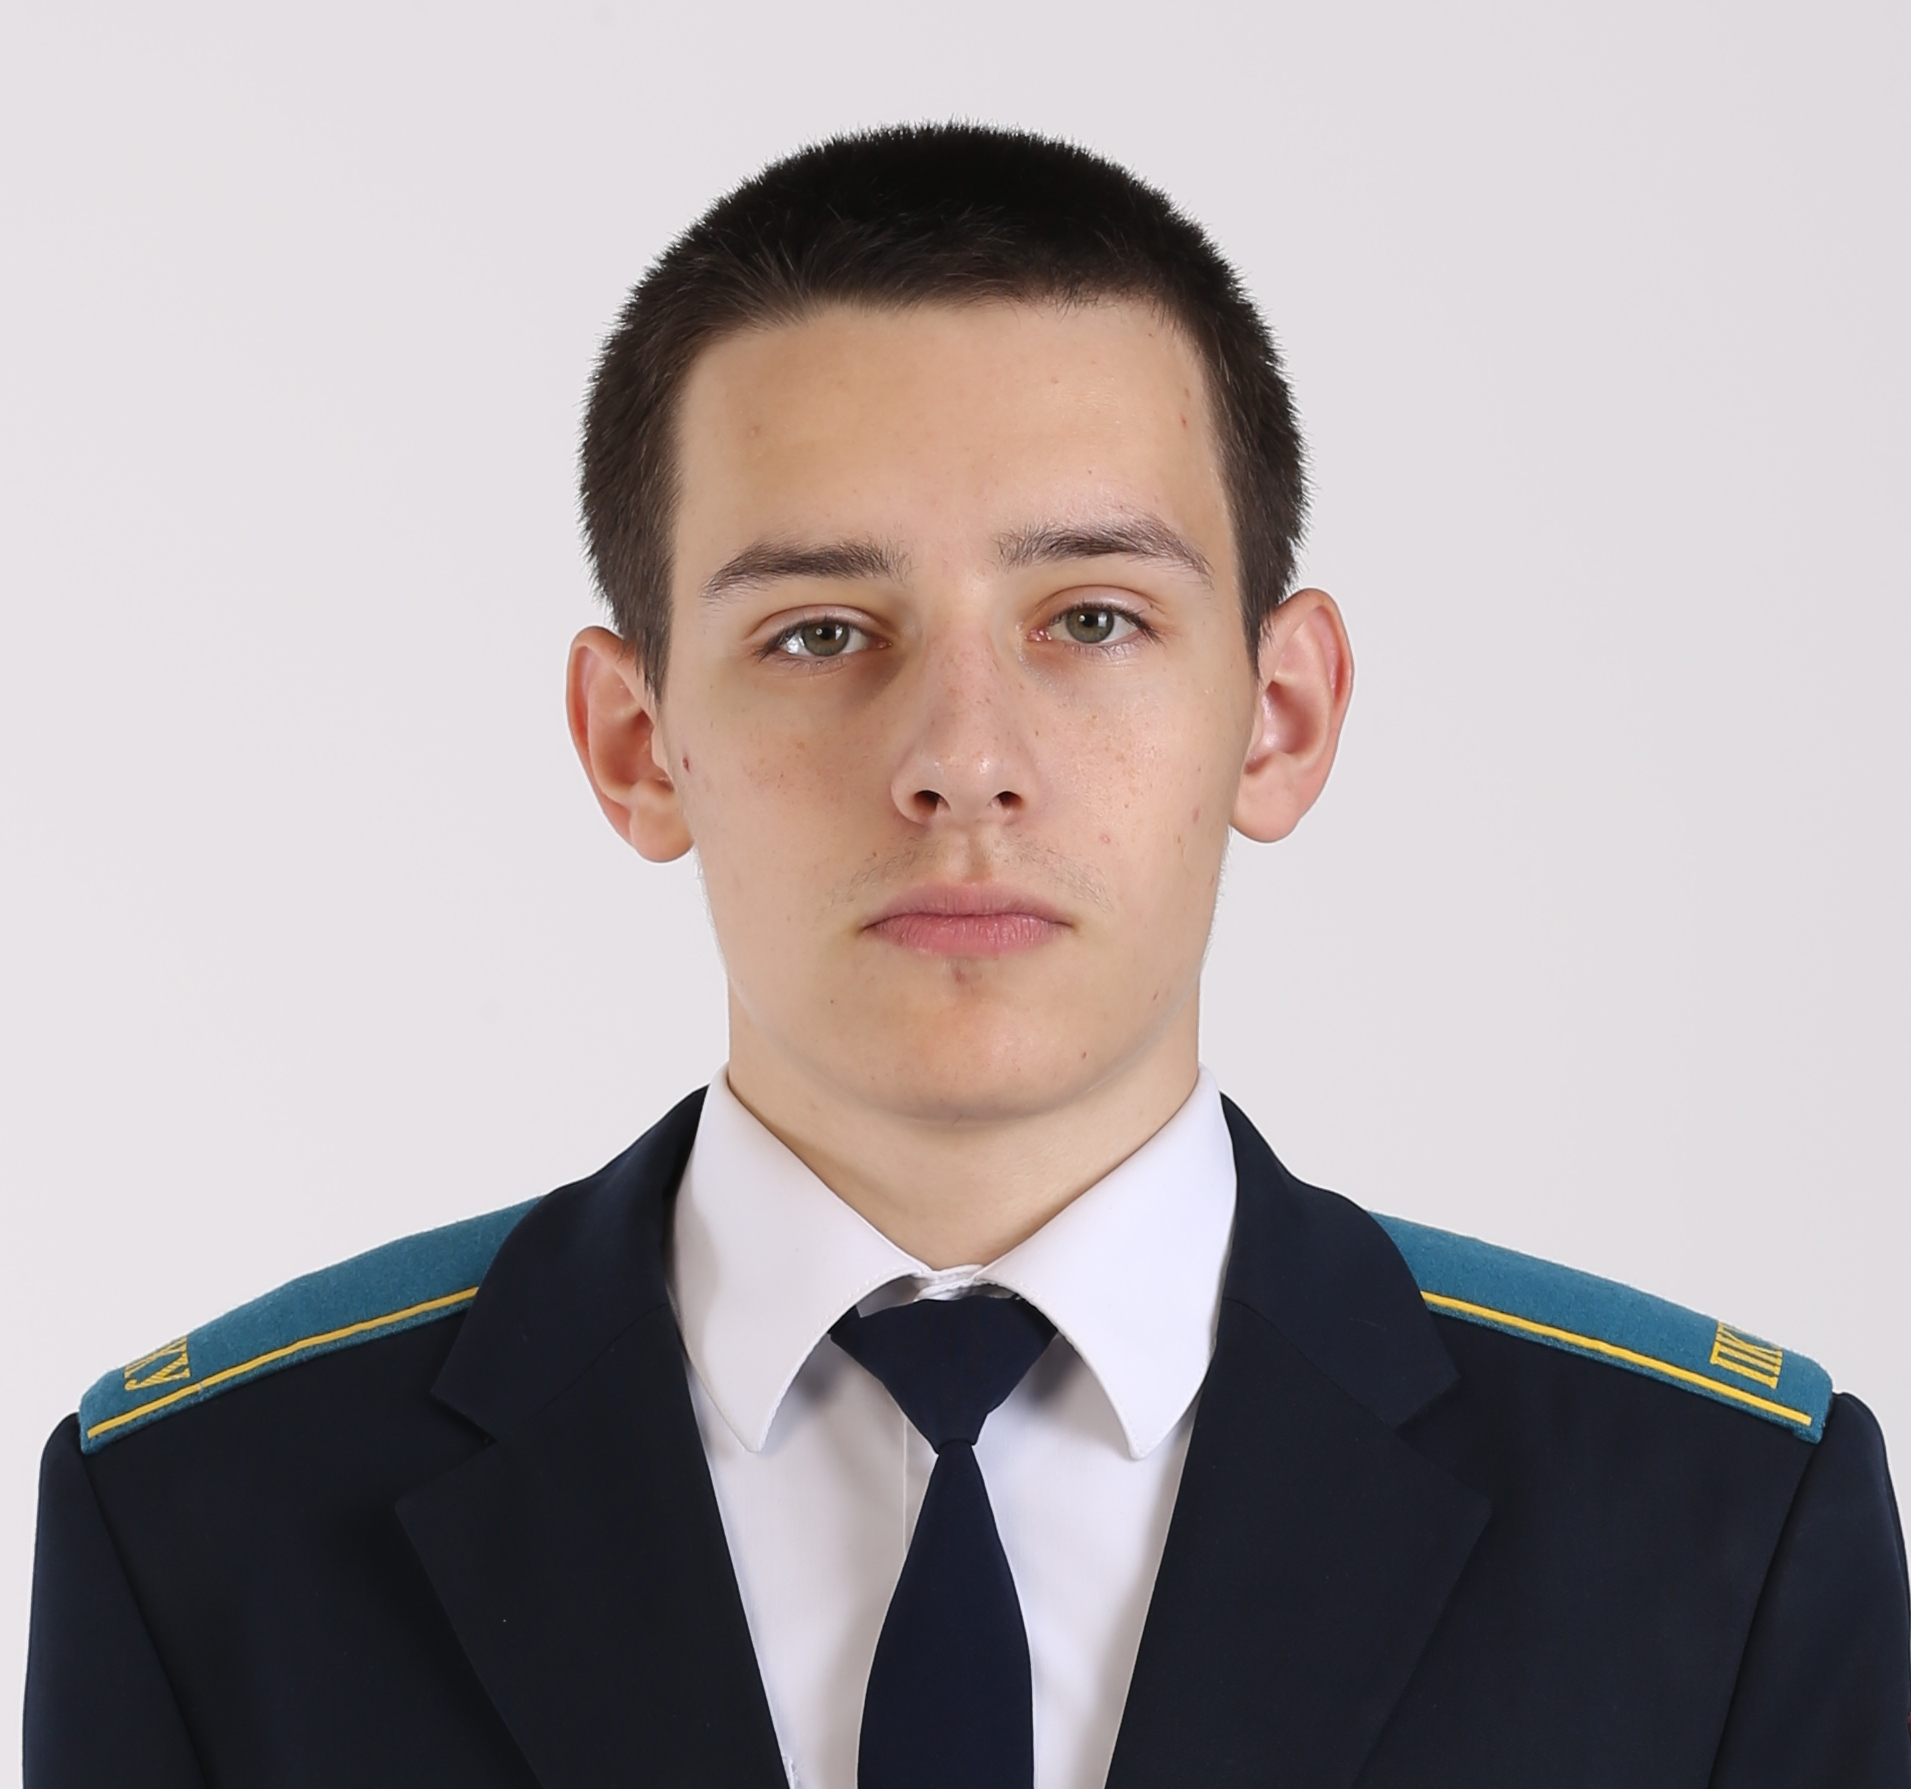 Юрченко Александр 2